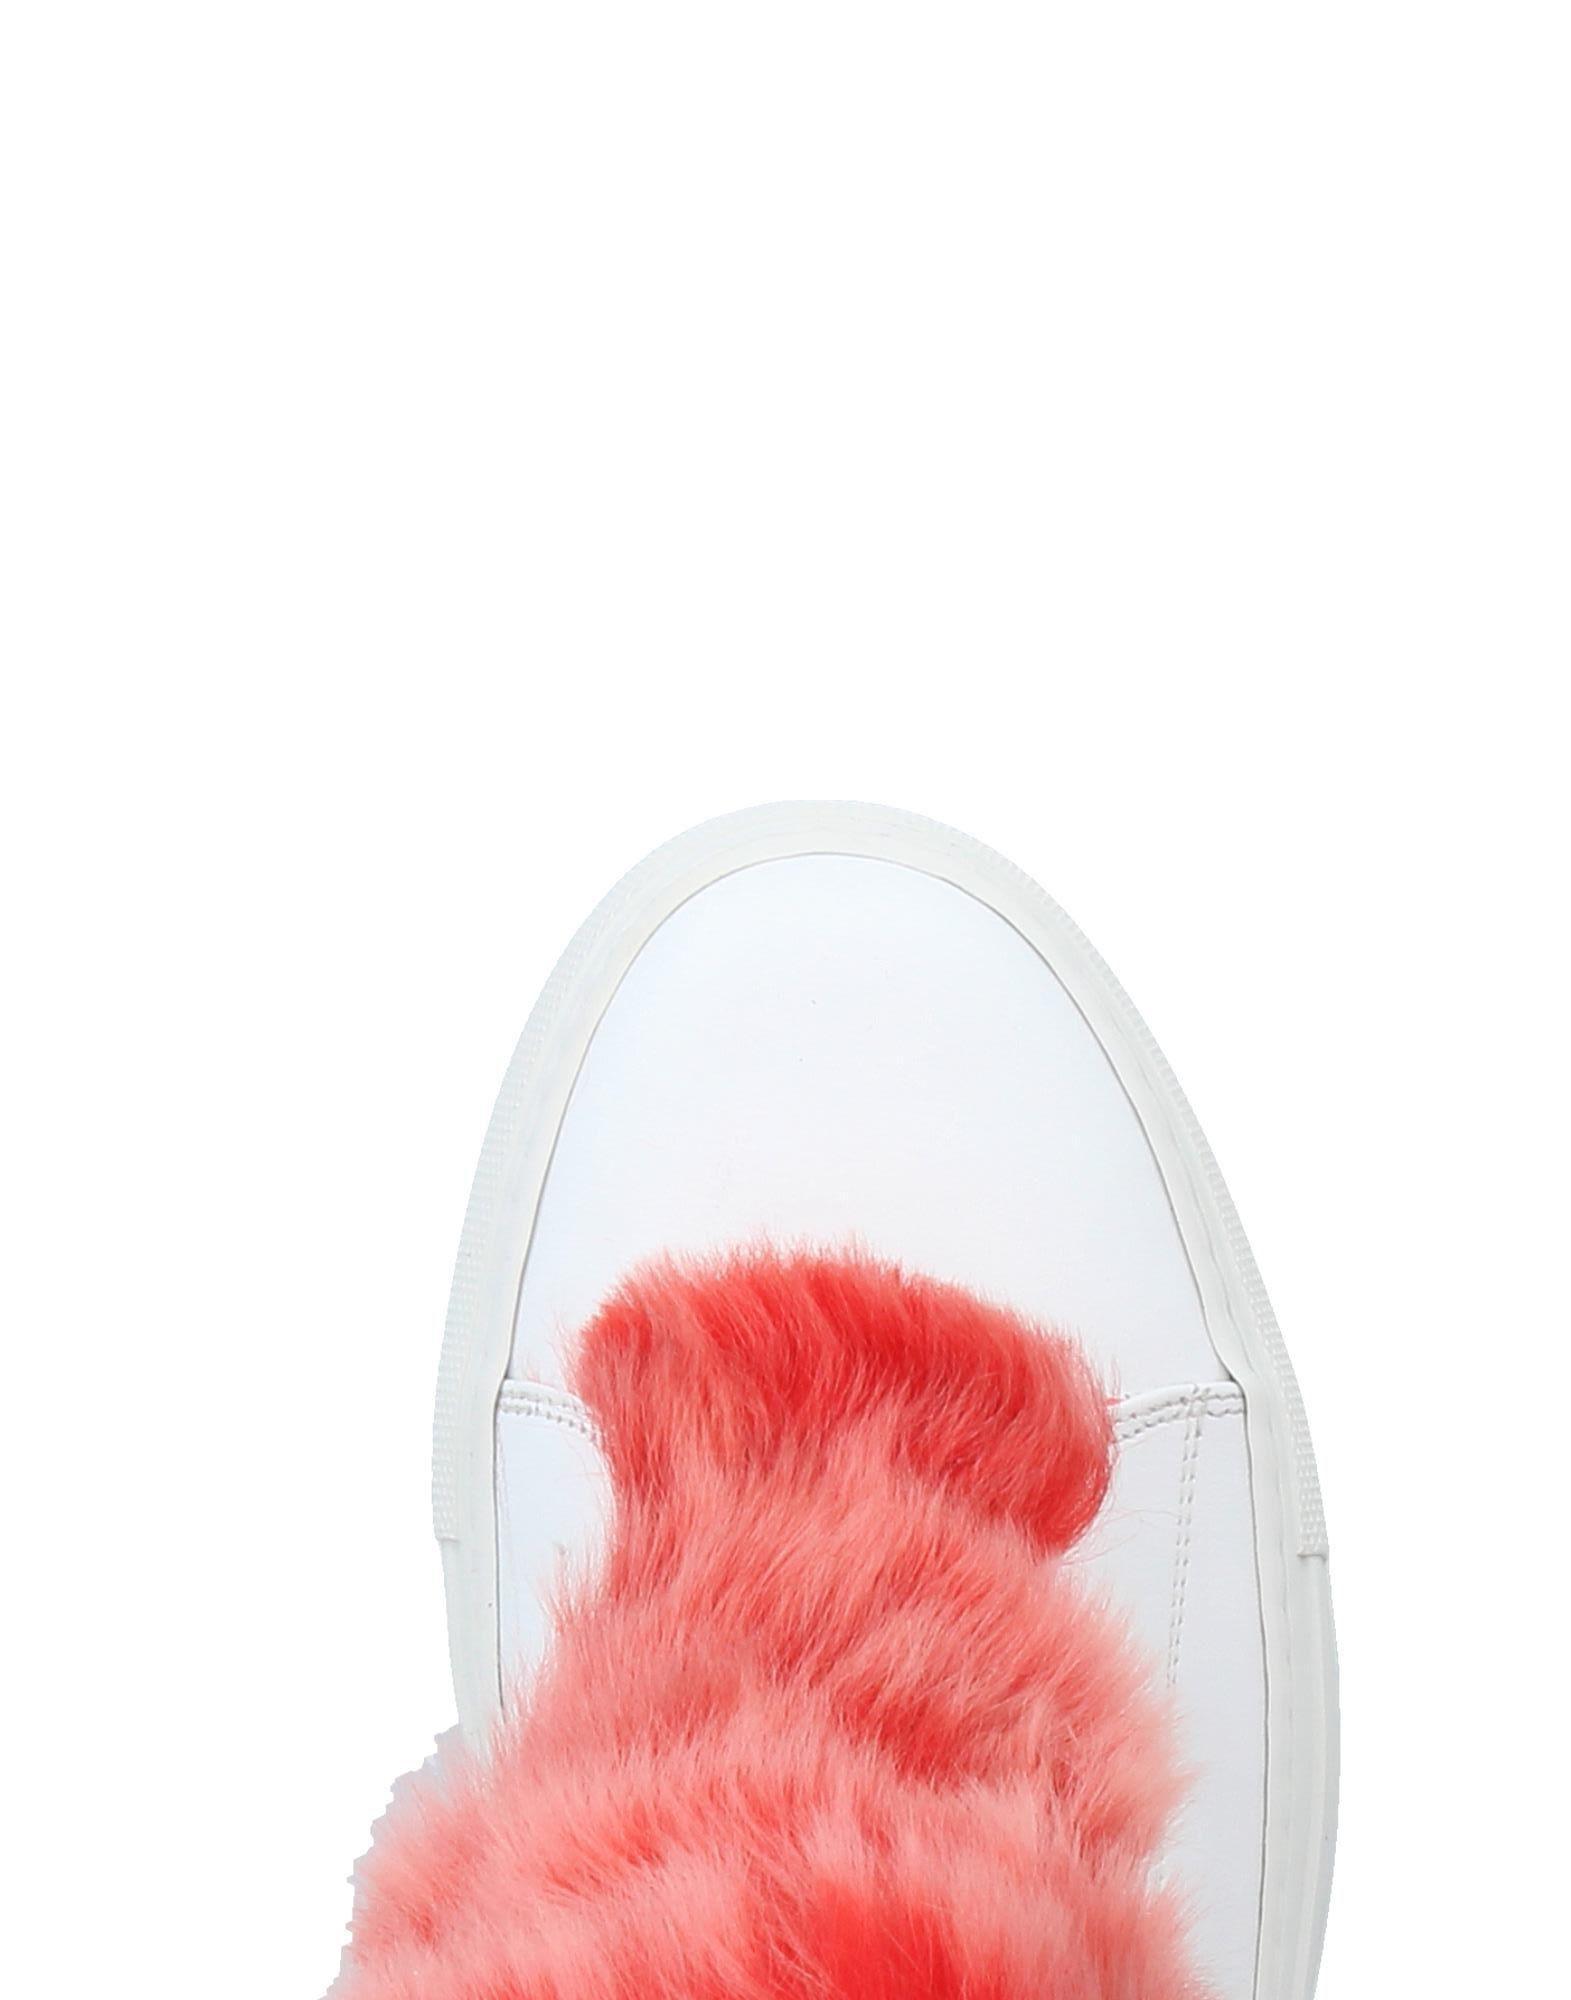 Alberto Moretti Leather High-tops & Sneakers in White